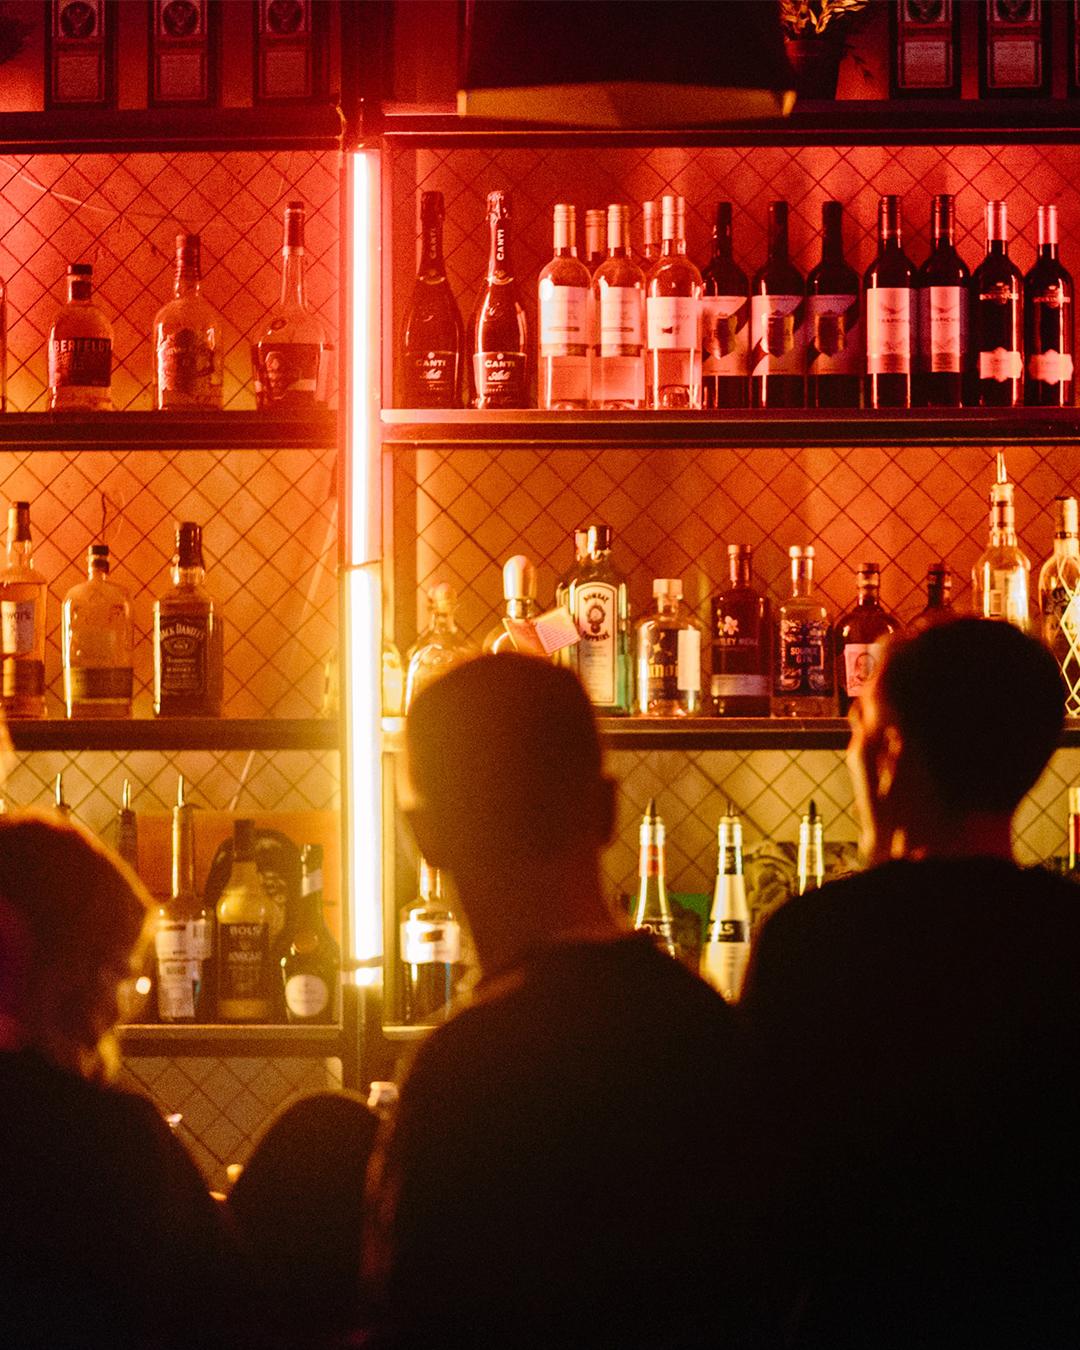 philadelphians allowed at bar